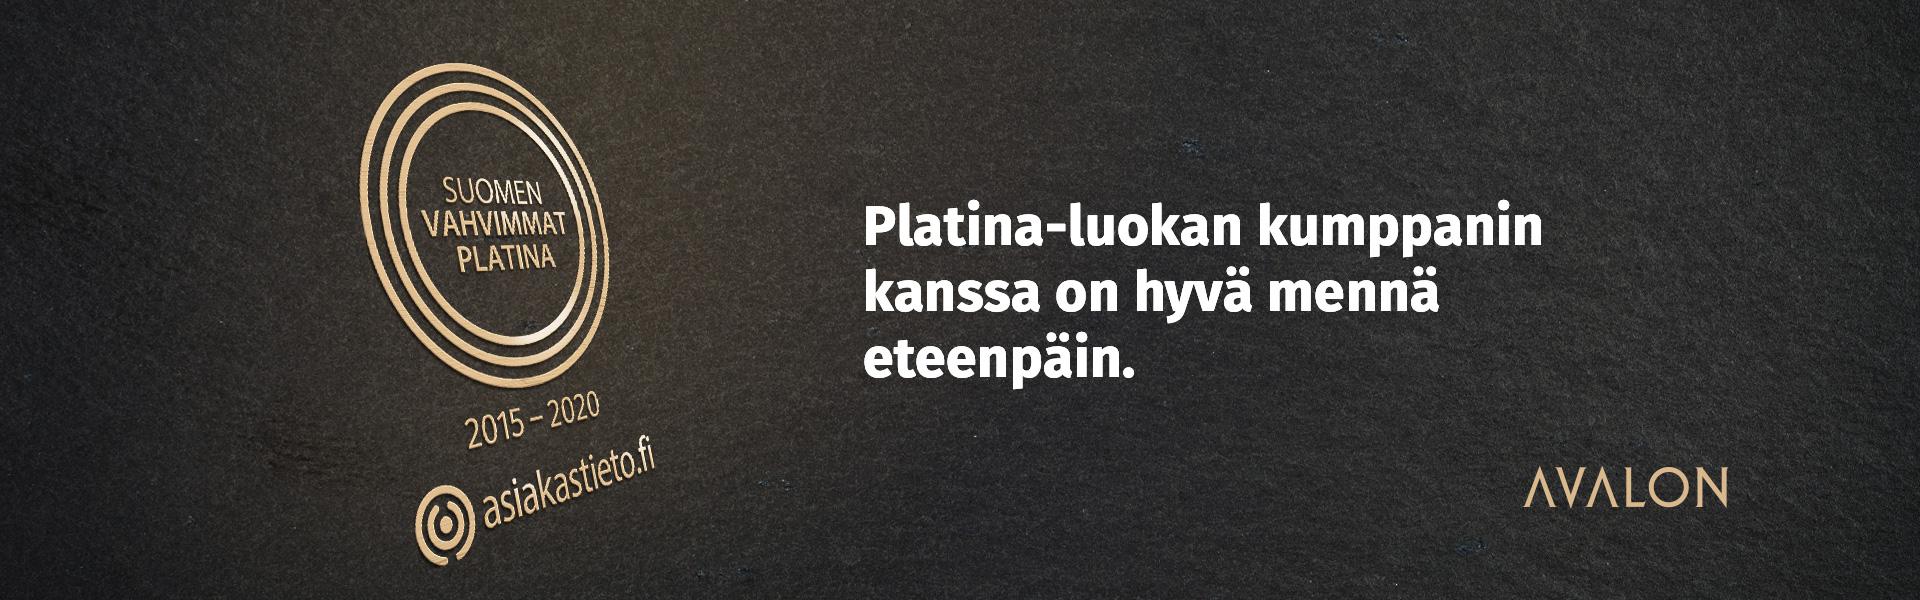 avalon_platina_banner_1920x600-1